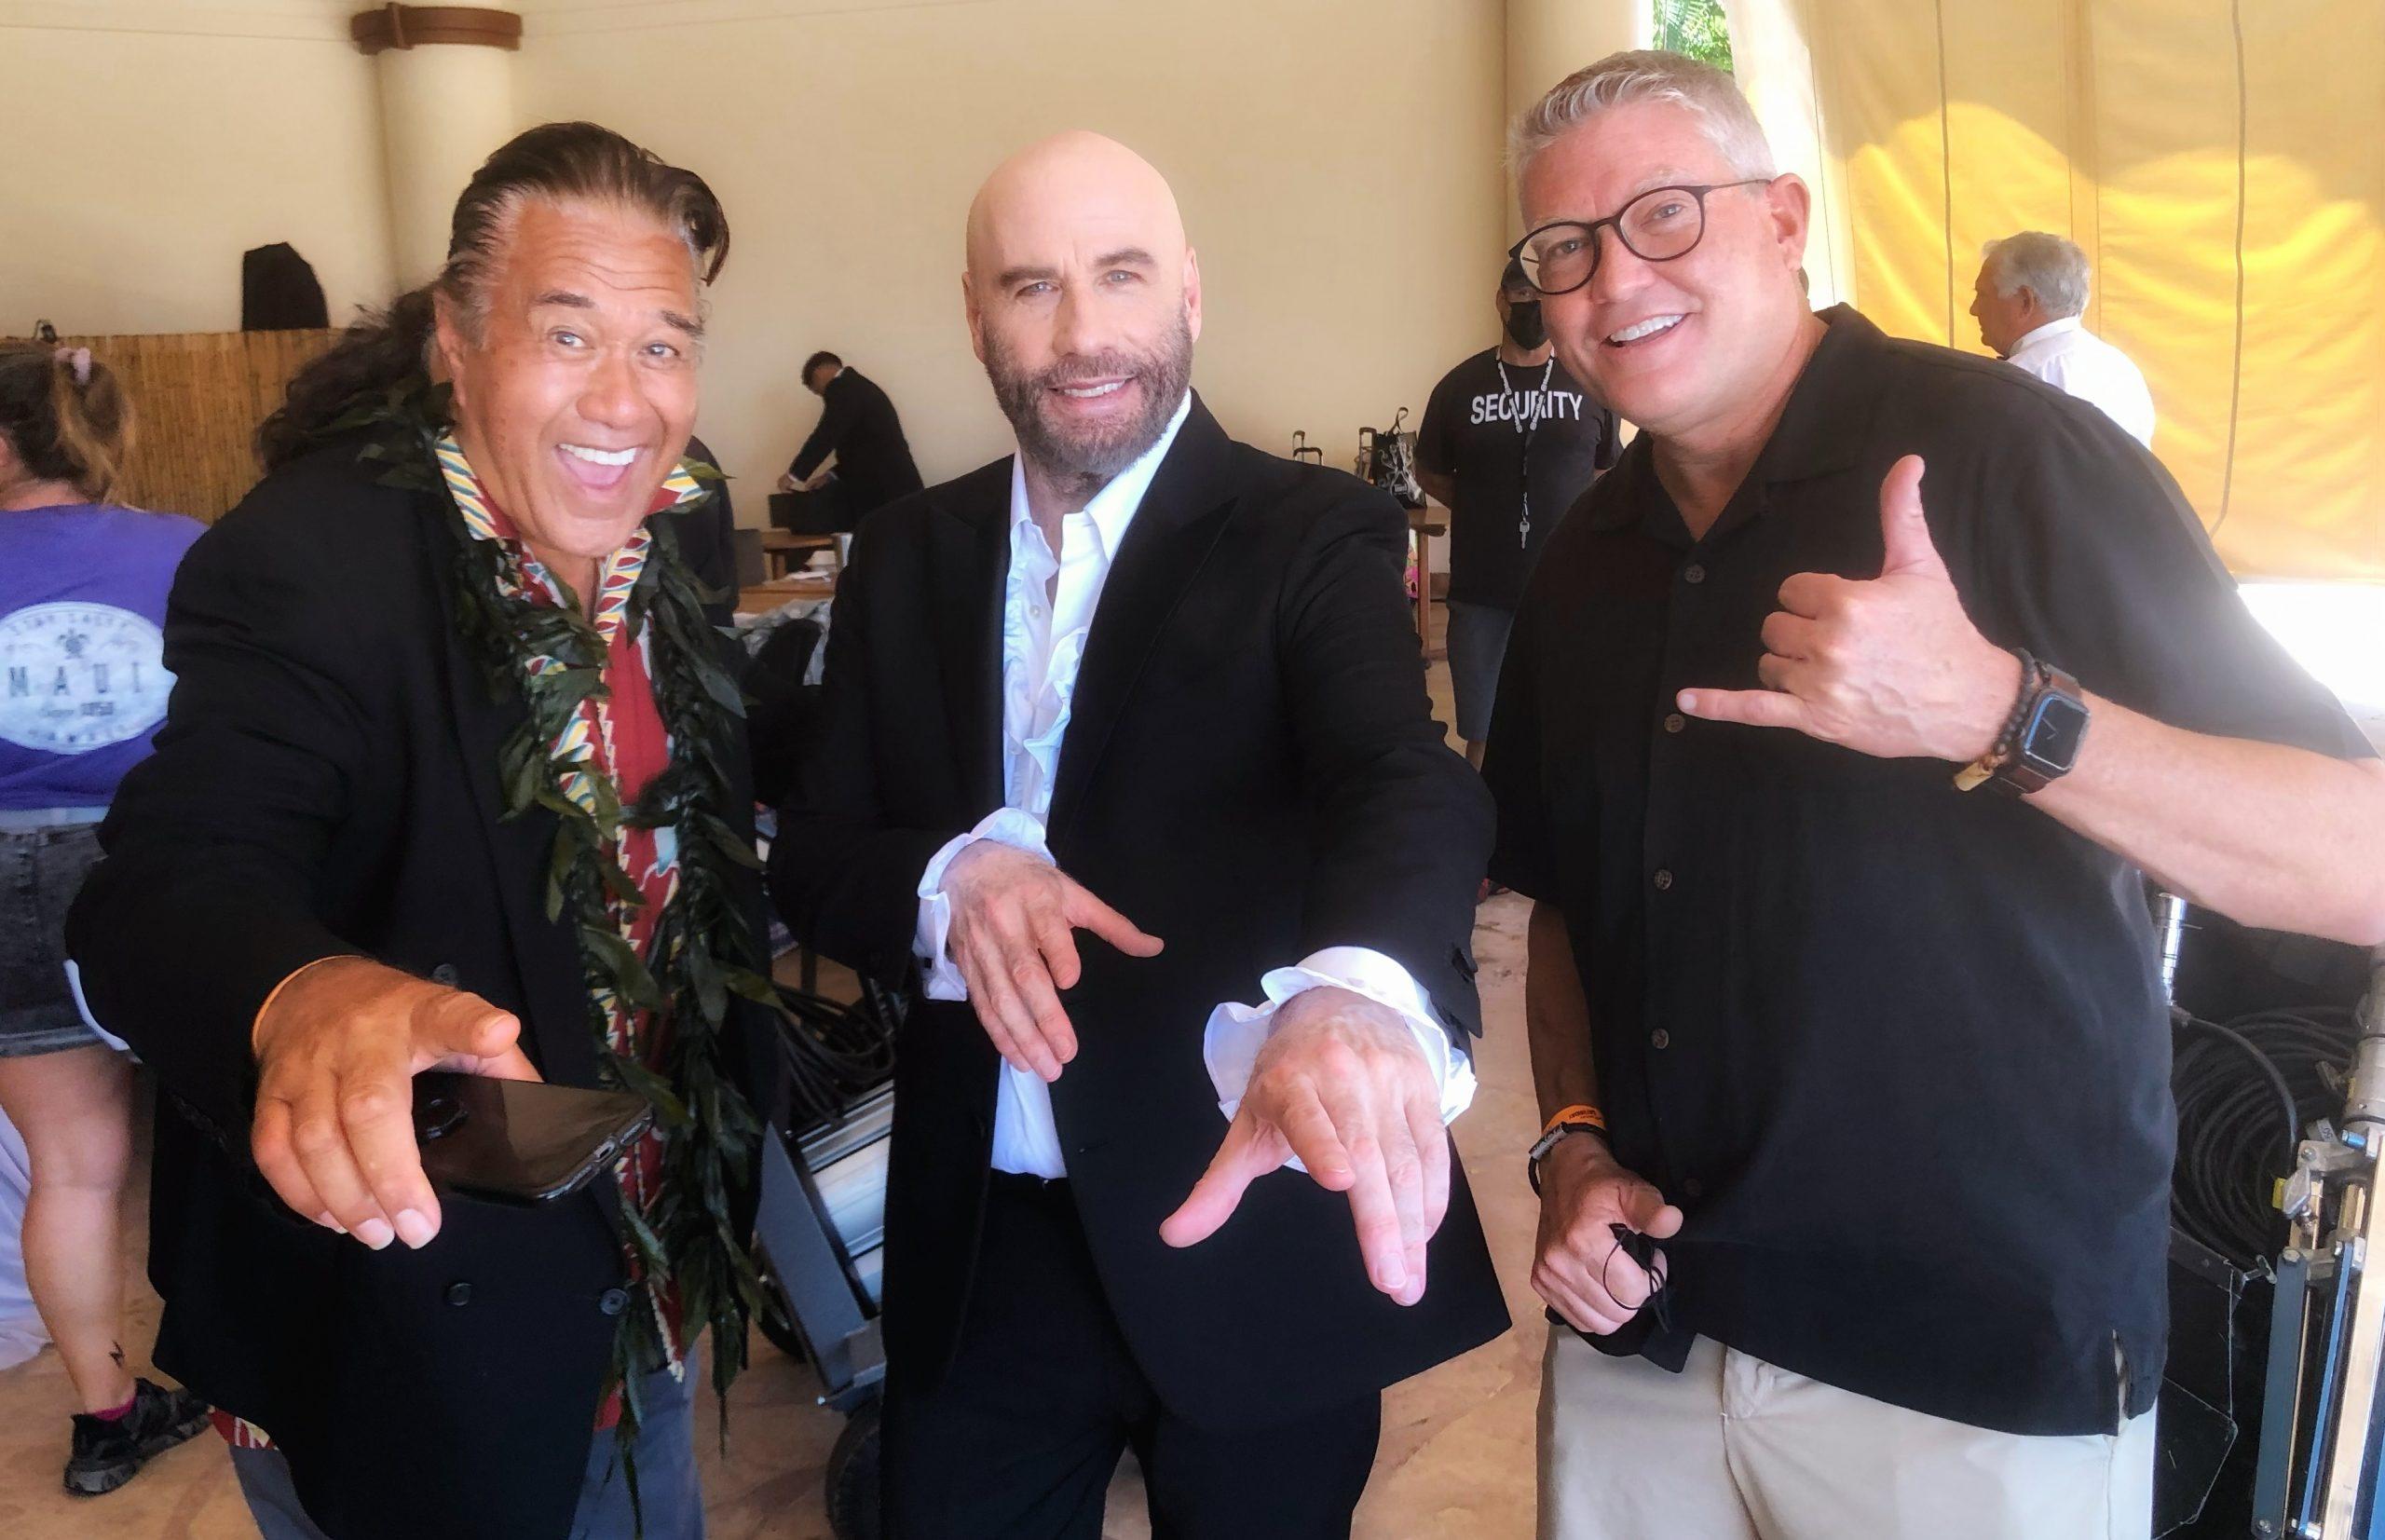 Maui Film Industry Reels Up in 2021: John Travolta, Bruce Willis, Guy Fieri, HBO, Hallmark and More